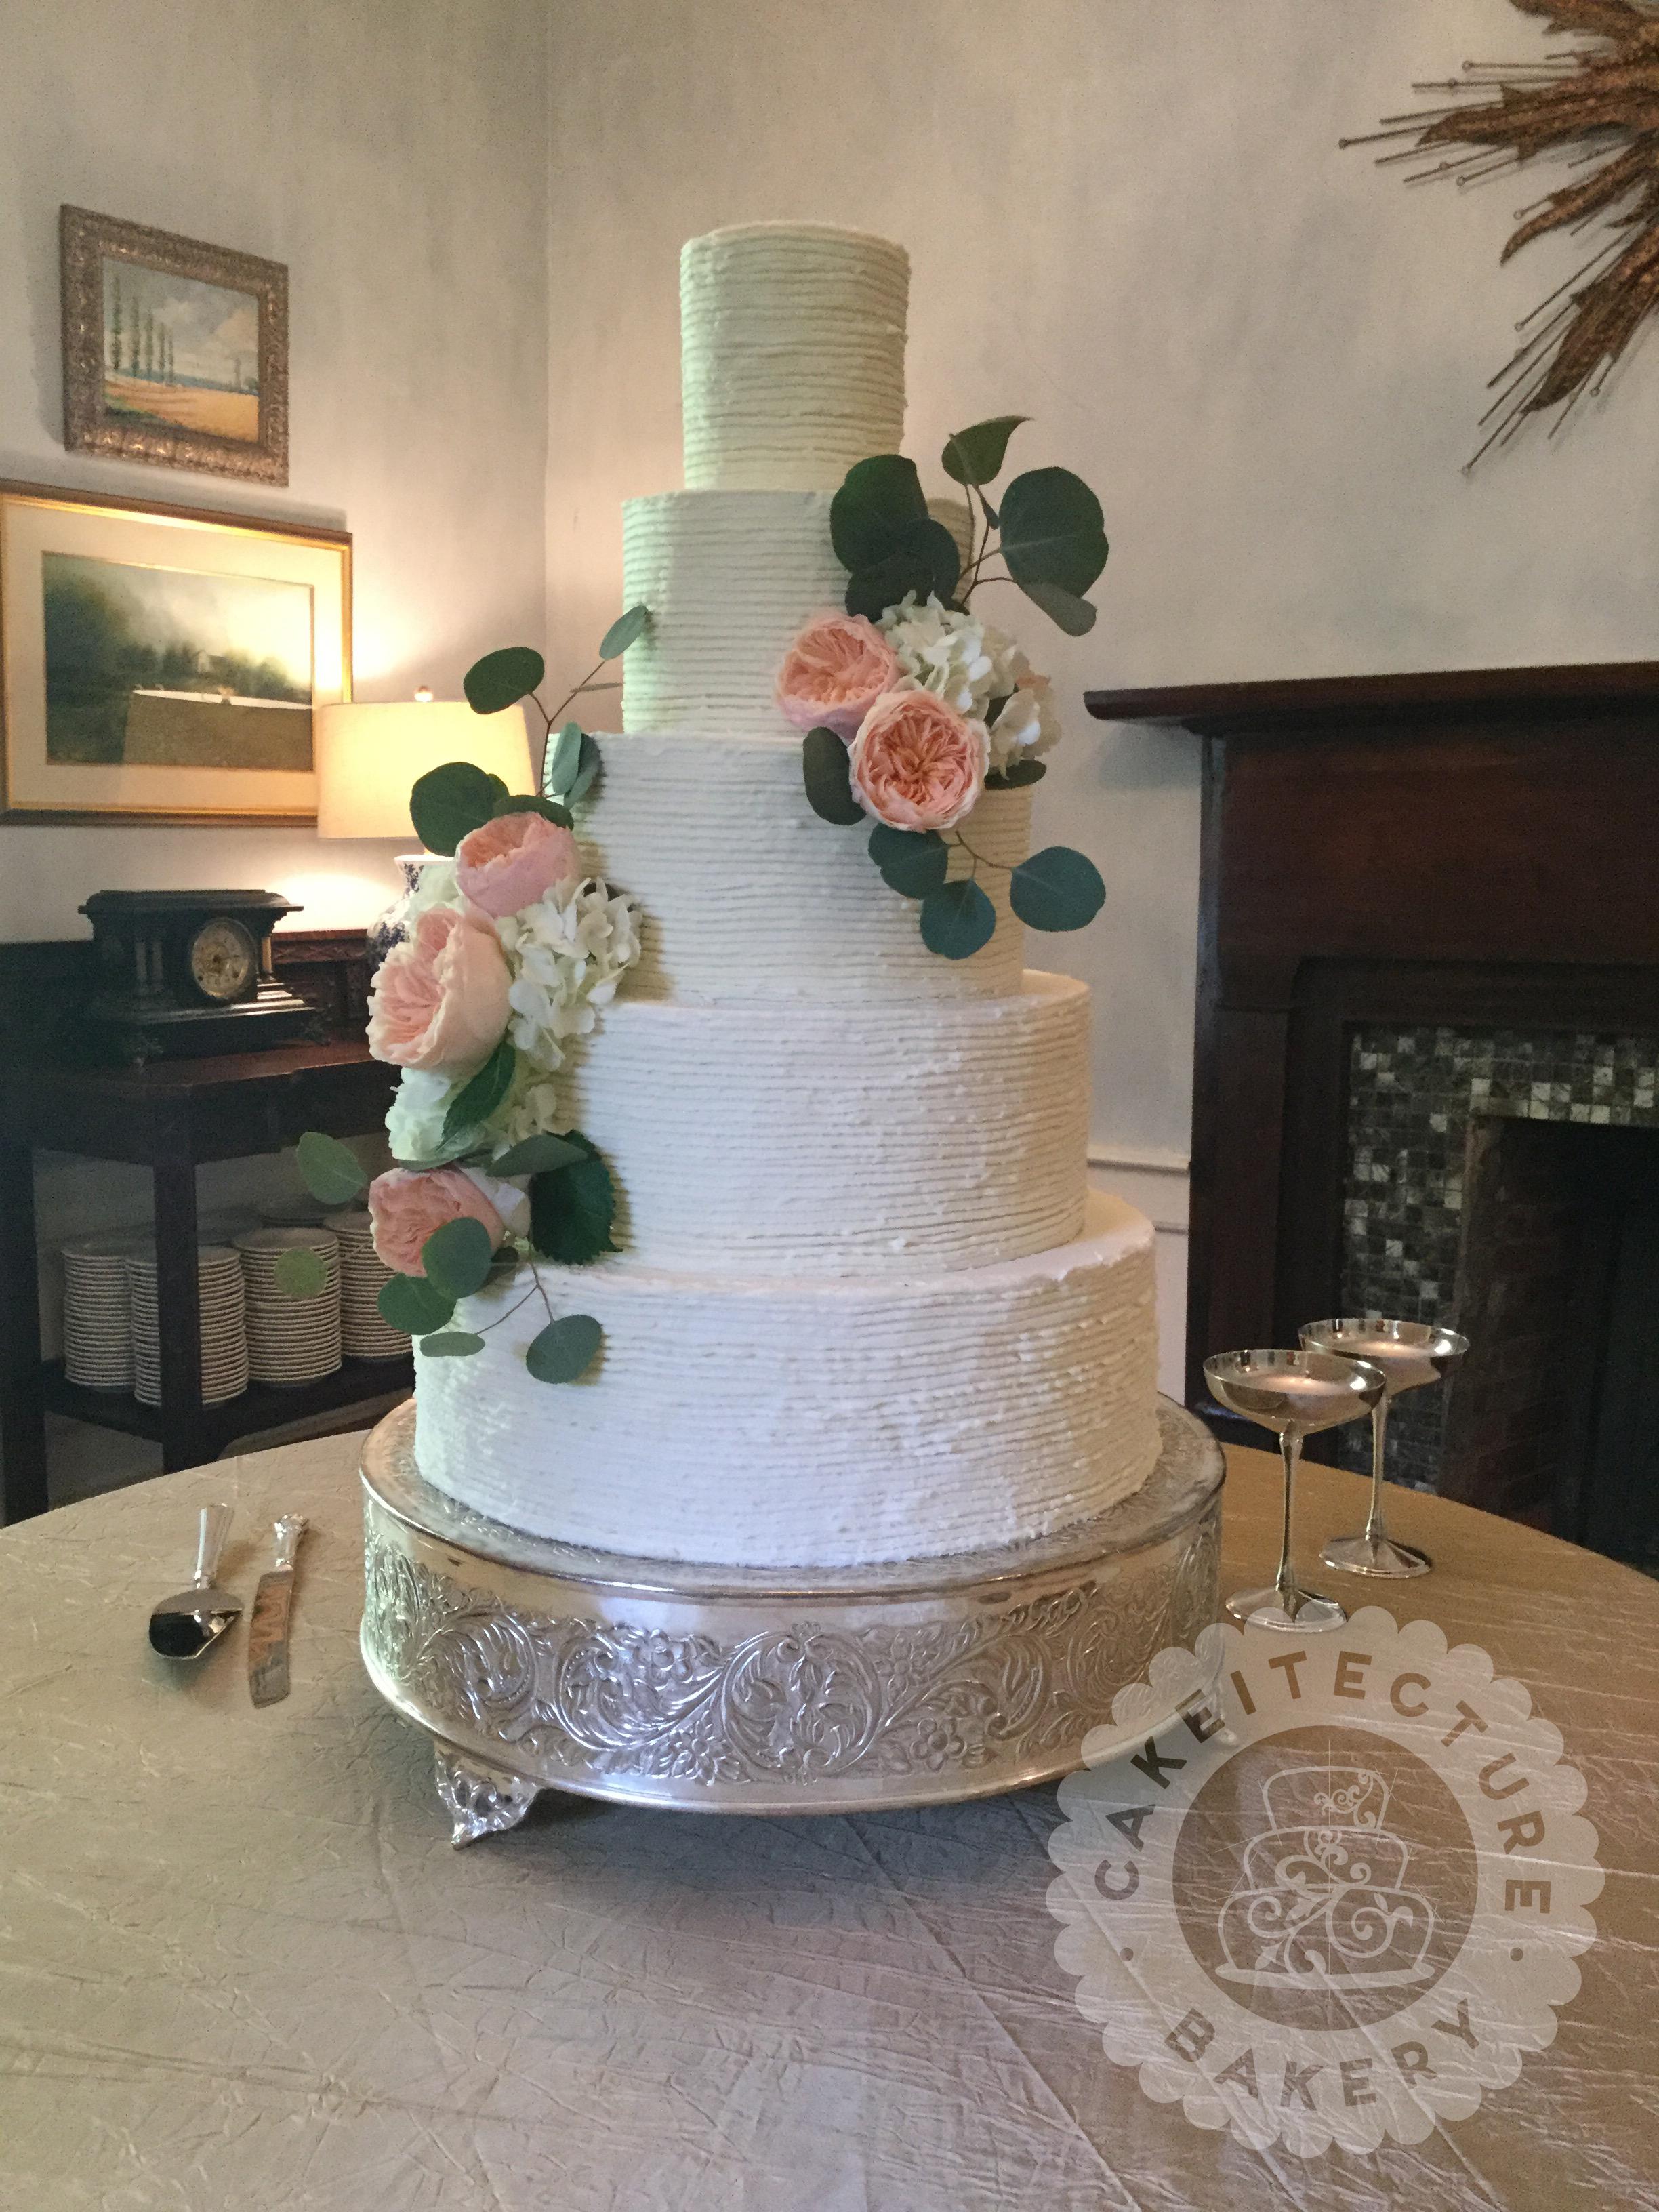 Cakeitecture Bakery 1702  wedding cake .jpg